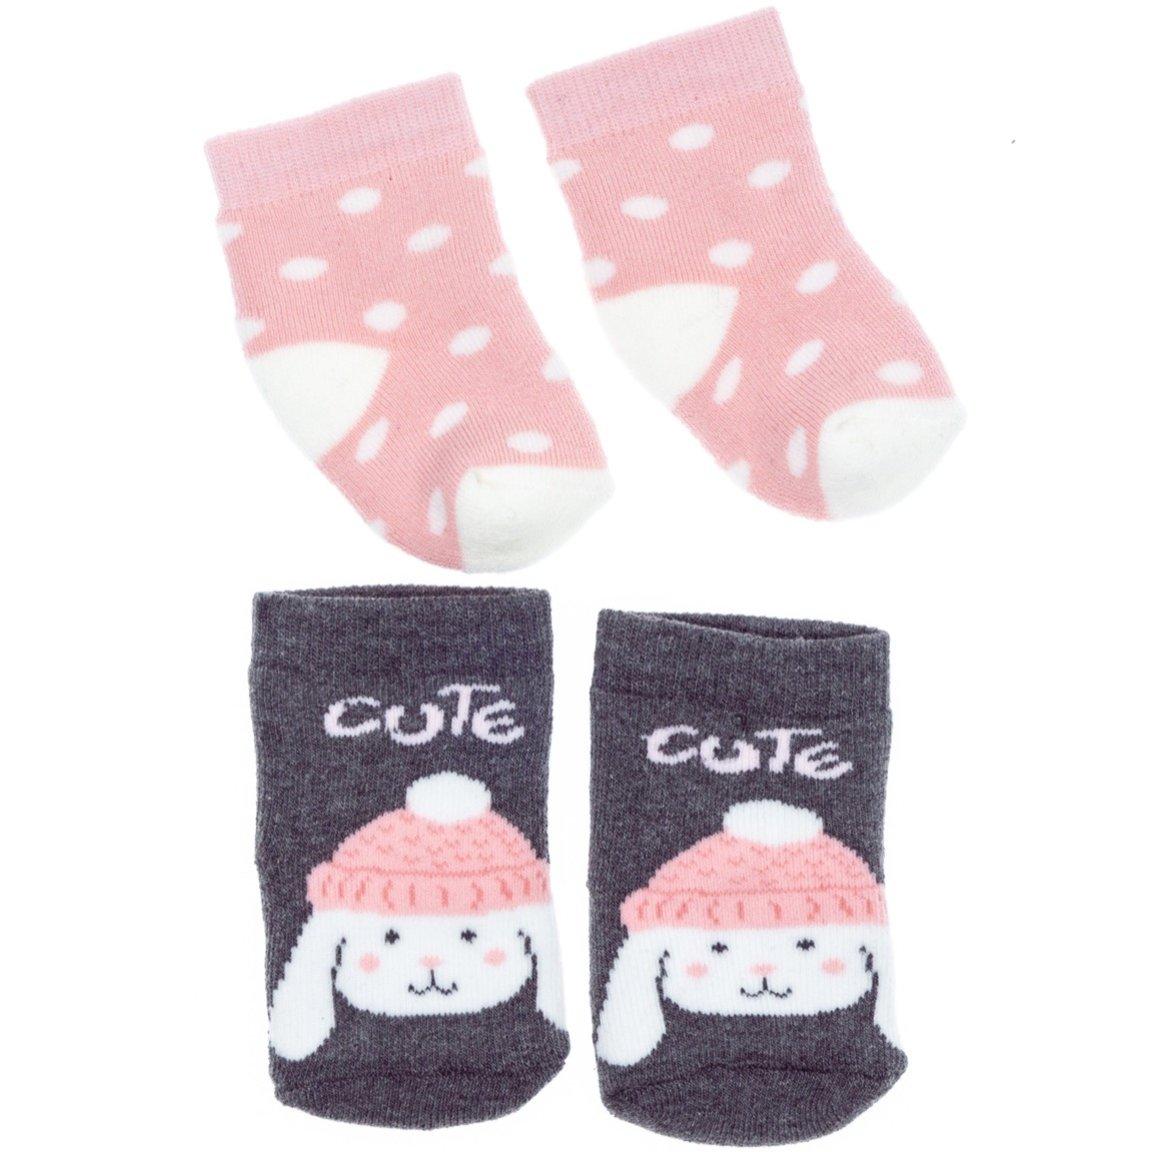 Bross σετ βρεφικές κάλτσες (δύο τεμάχια) «Cute Bunny»